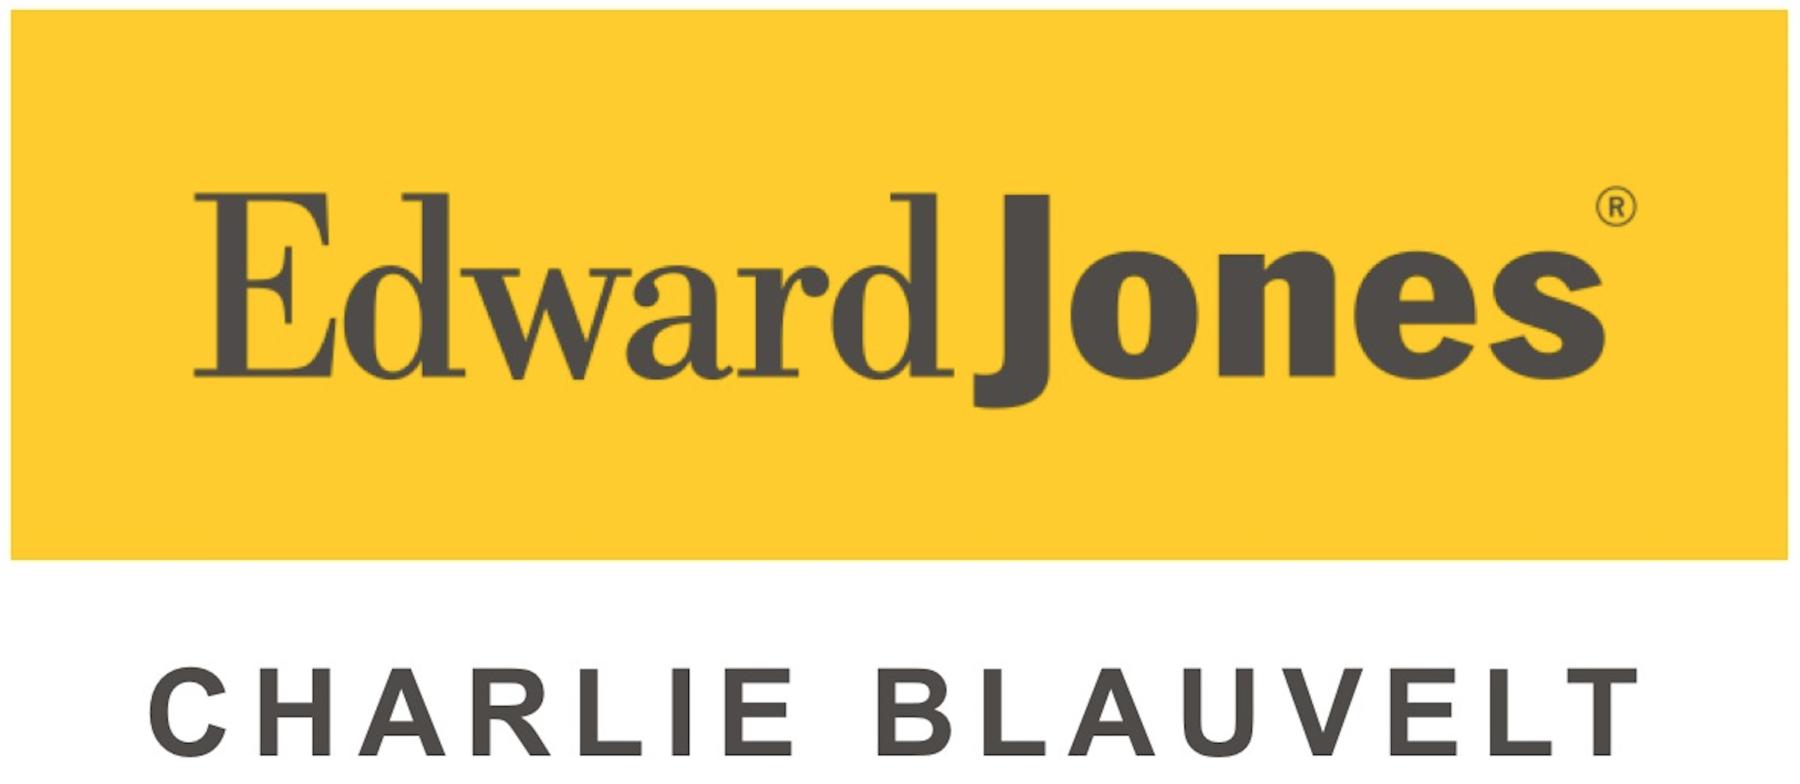 https://www.arlingtontx.com/wp-content/uploads/2021/05/EdwardJones-CharlieBlauvelt.png